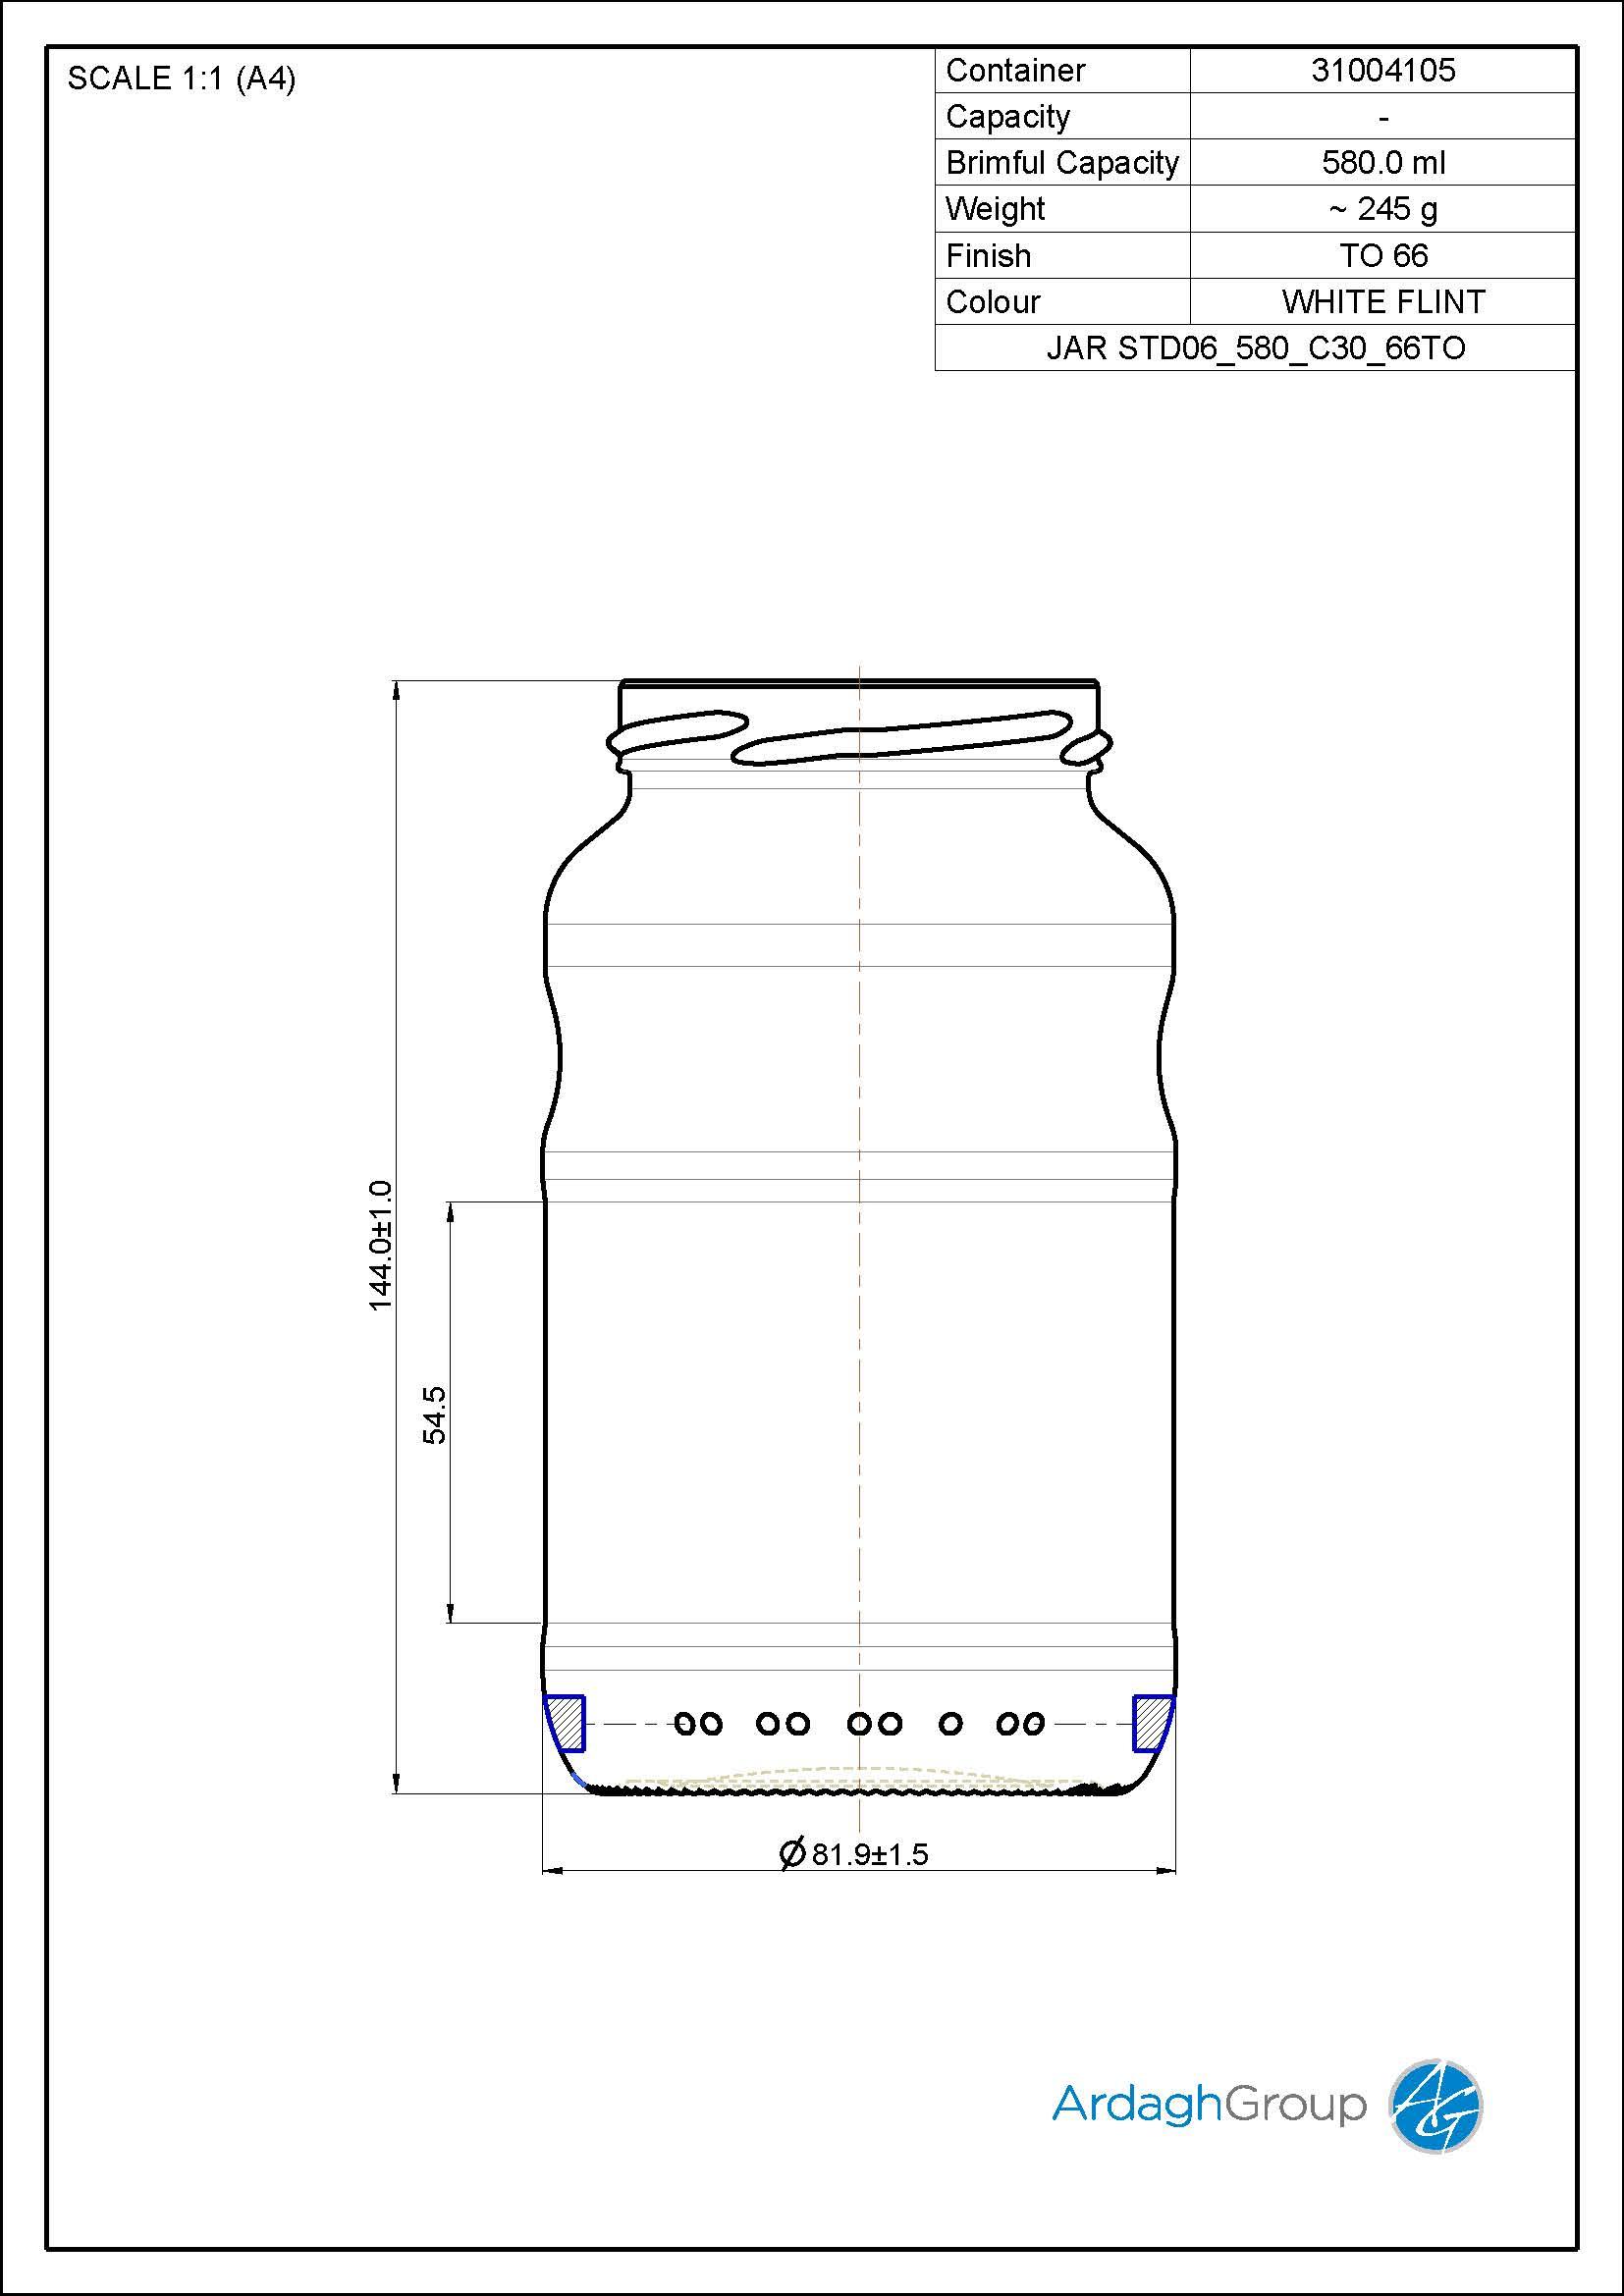 Jar STD06 580 C30 66TO